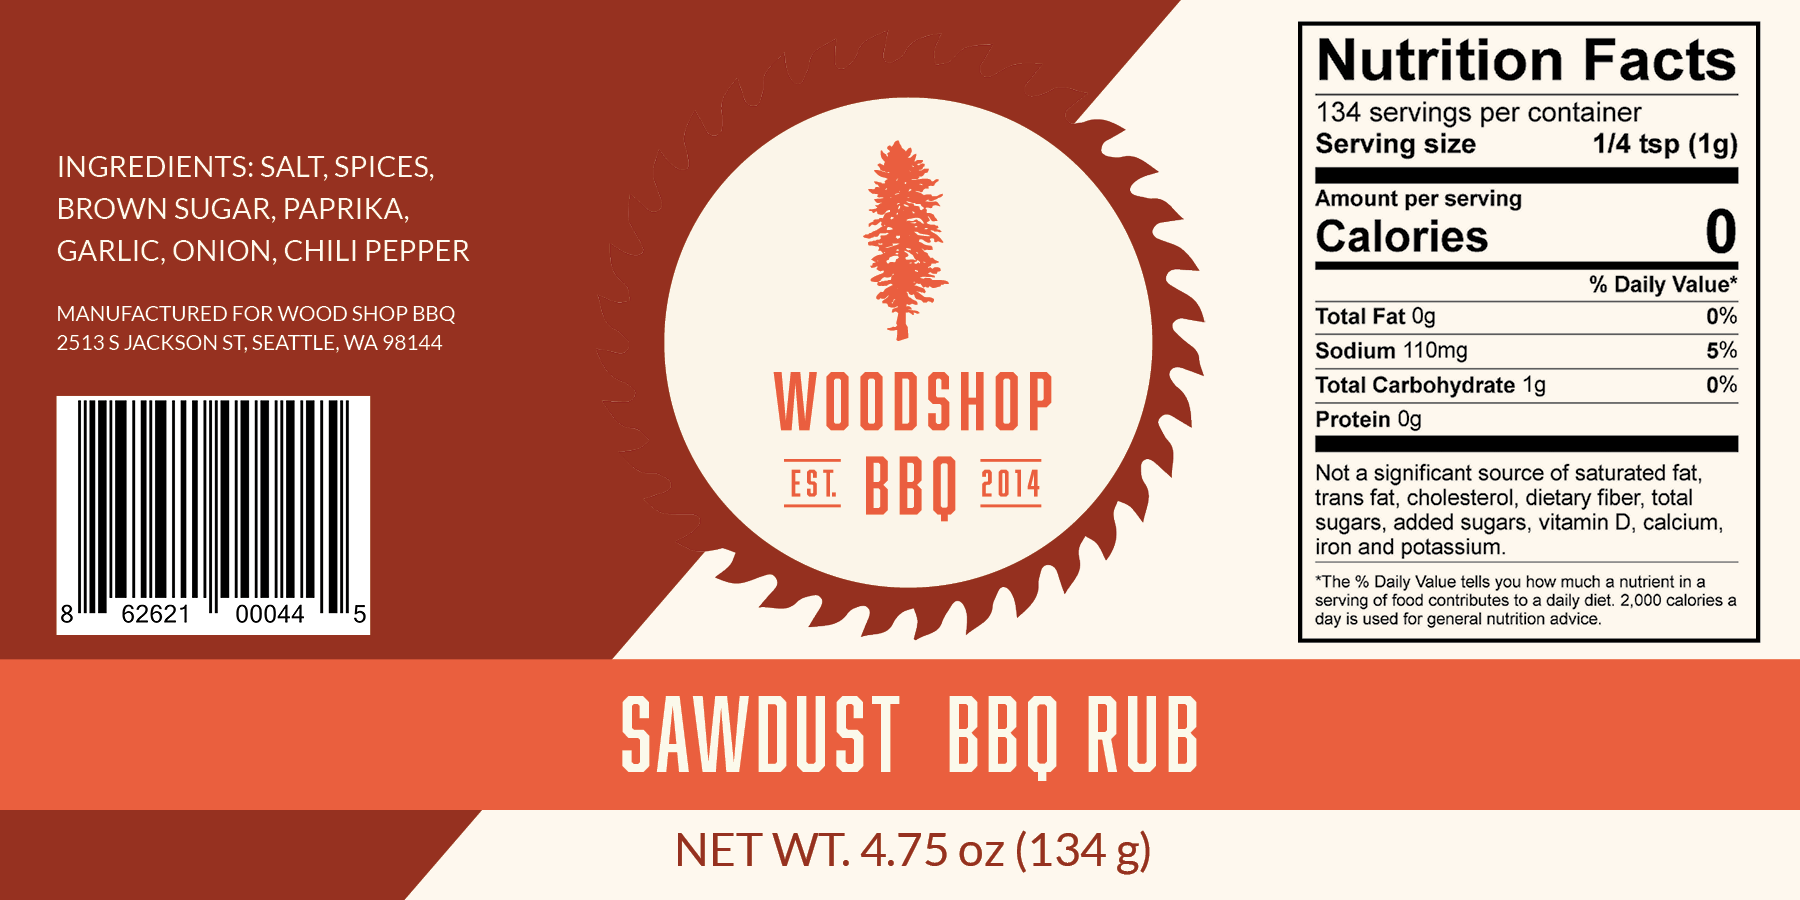 Sawdust Label